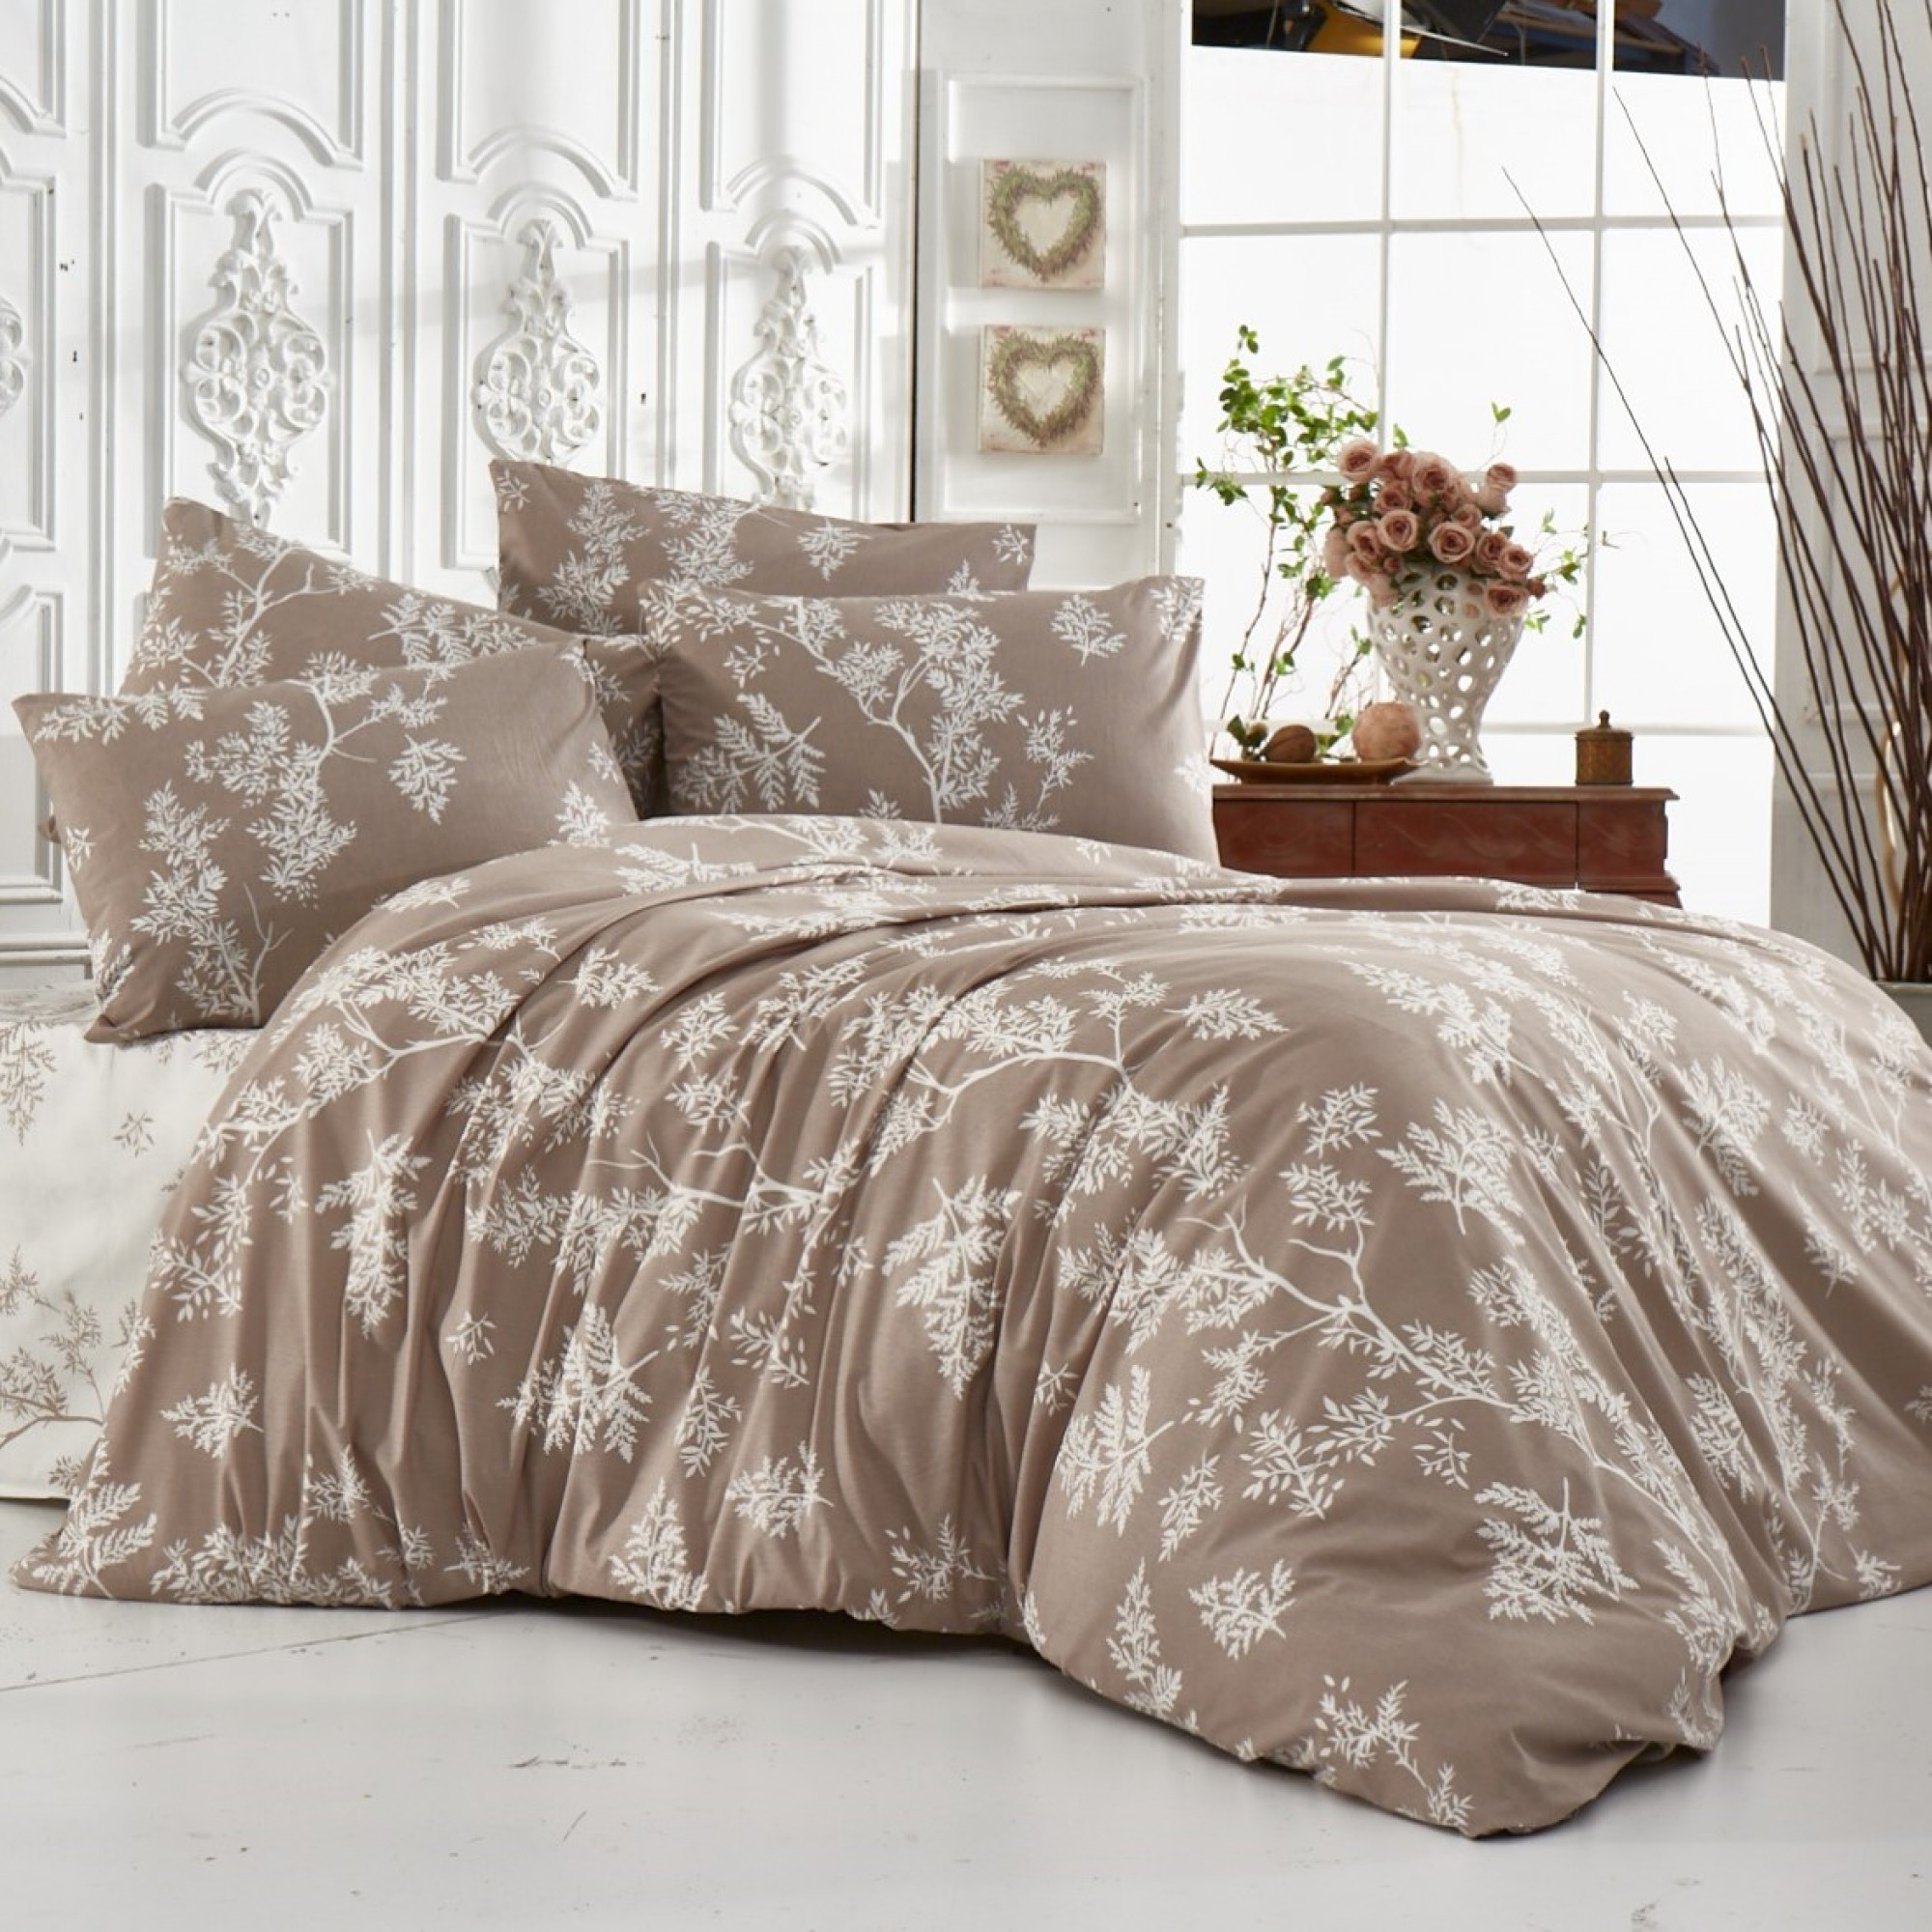 Beige Style спално бельо от Ранфорс